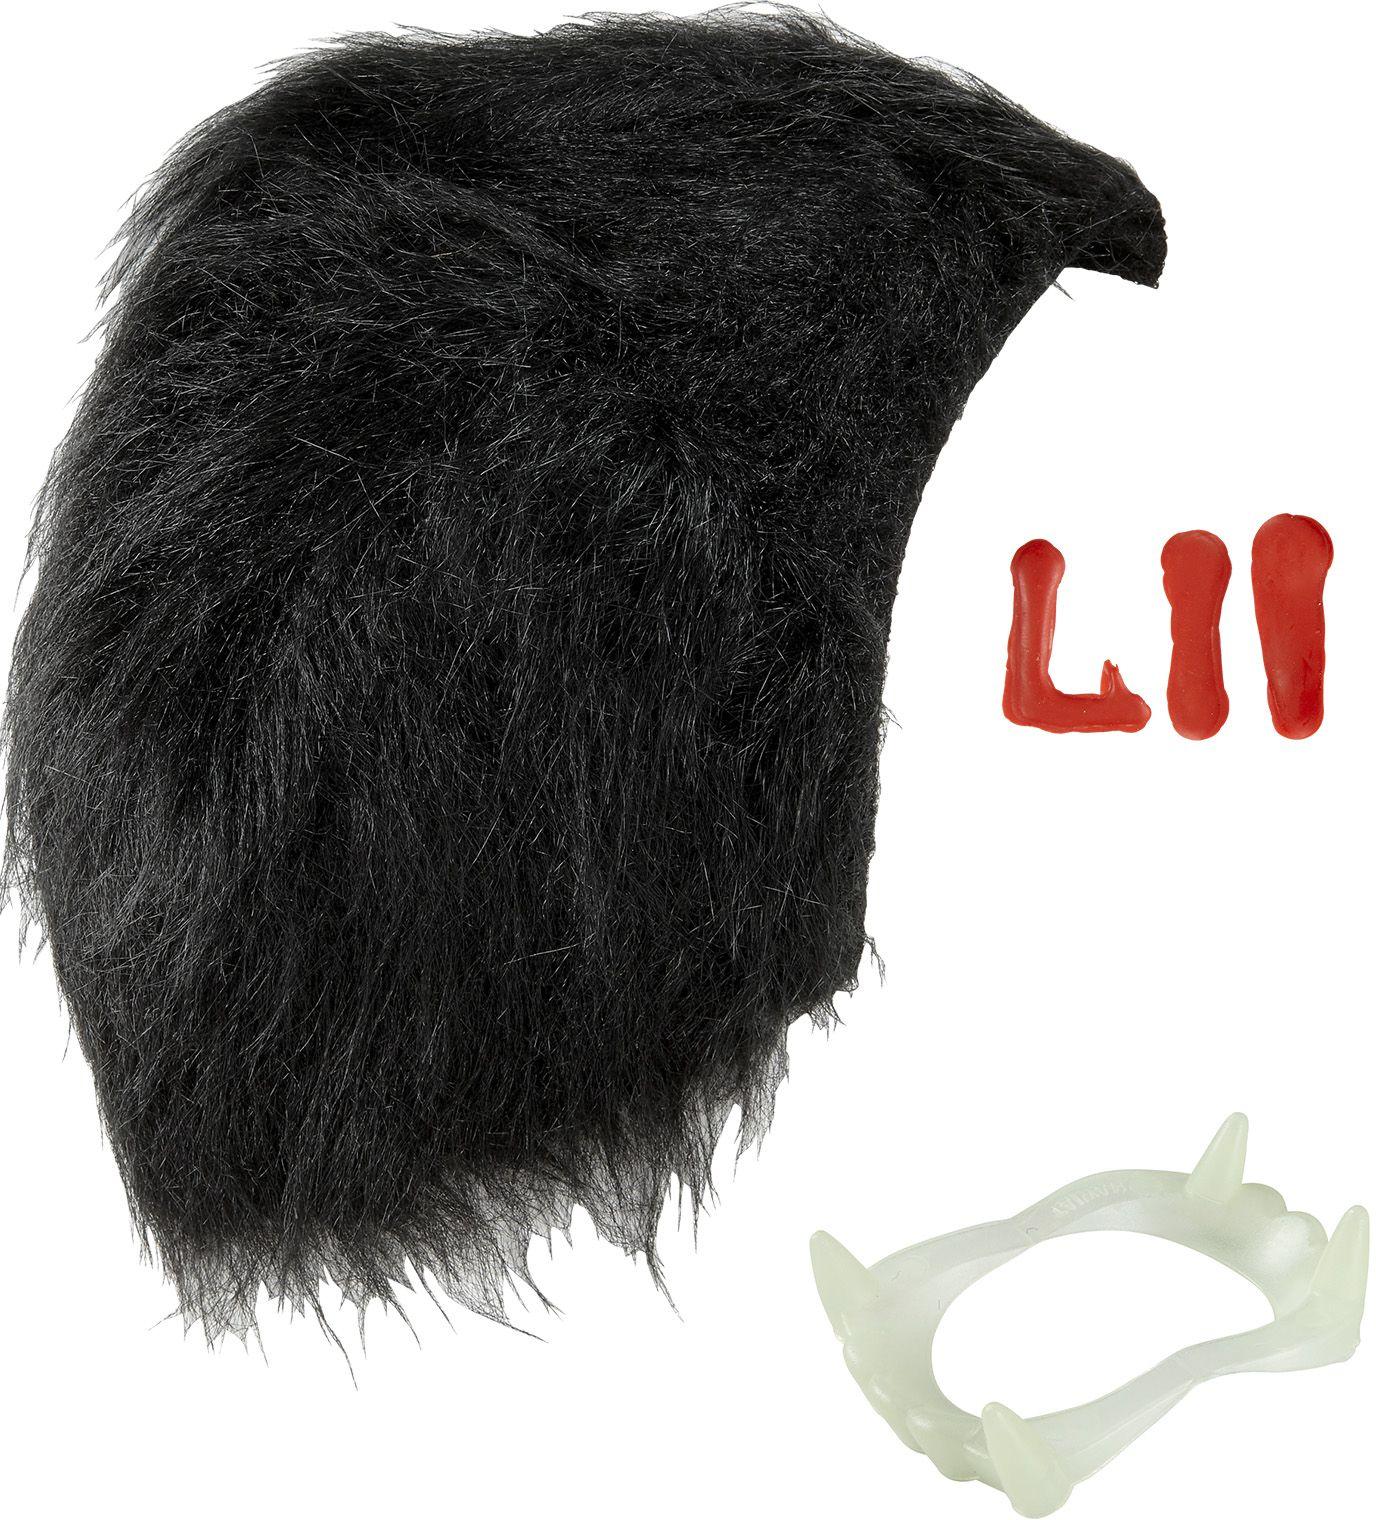 Dracula tanden, pruik en bloeddruppels